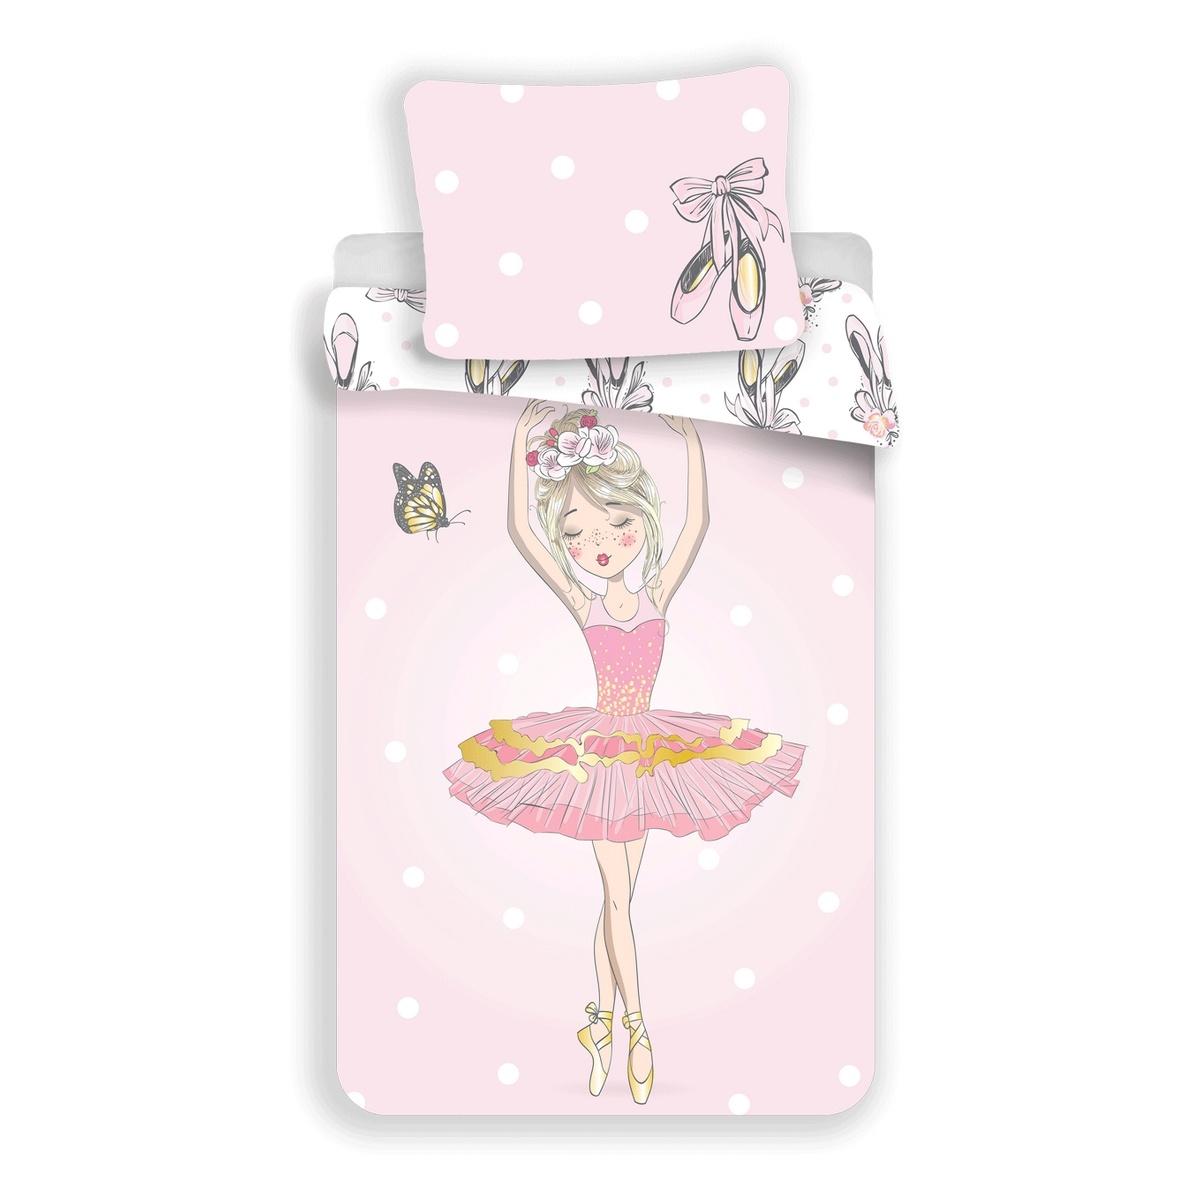 Jerry Fabrics Bavlnené obliečky Ballerina, 140 x 200 cm, 70 x 90 cm